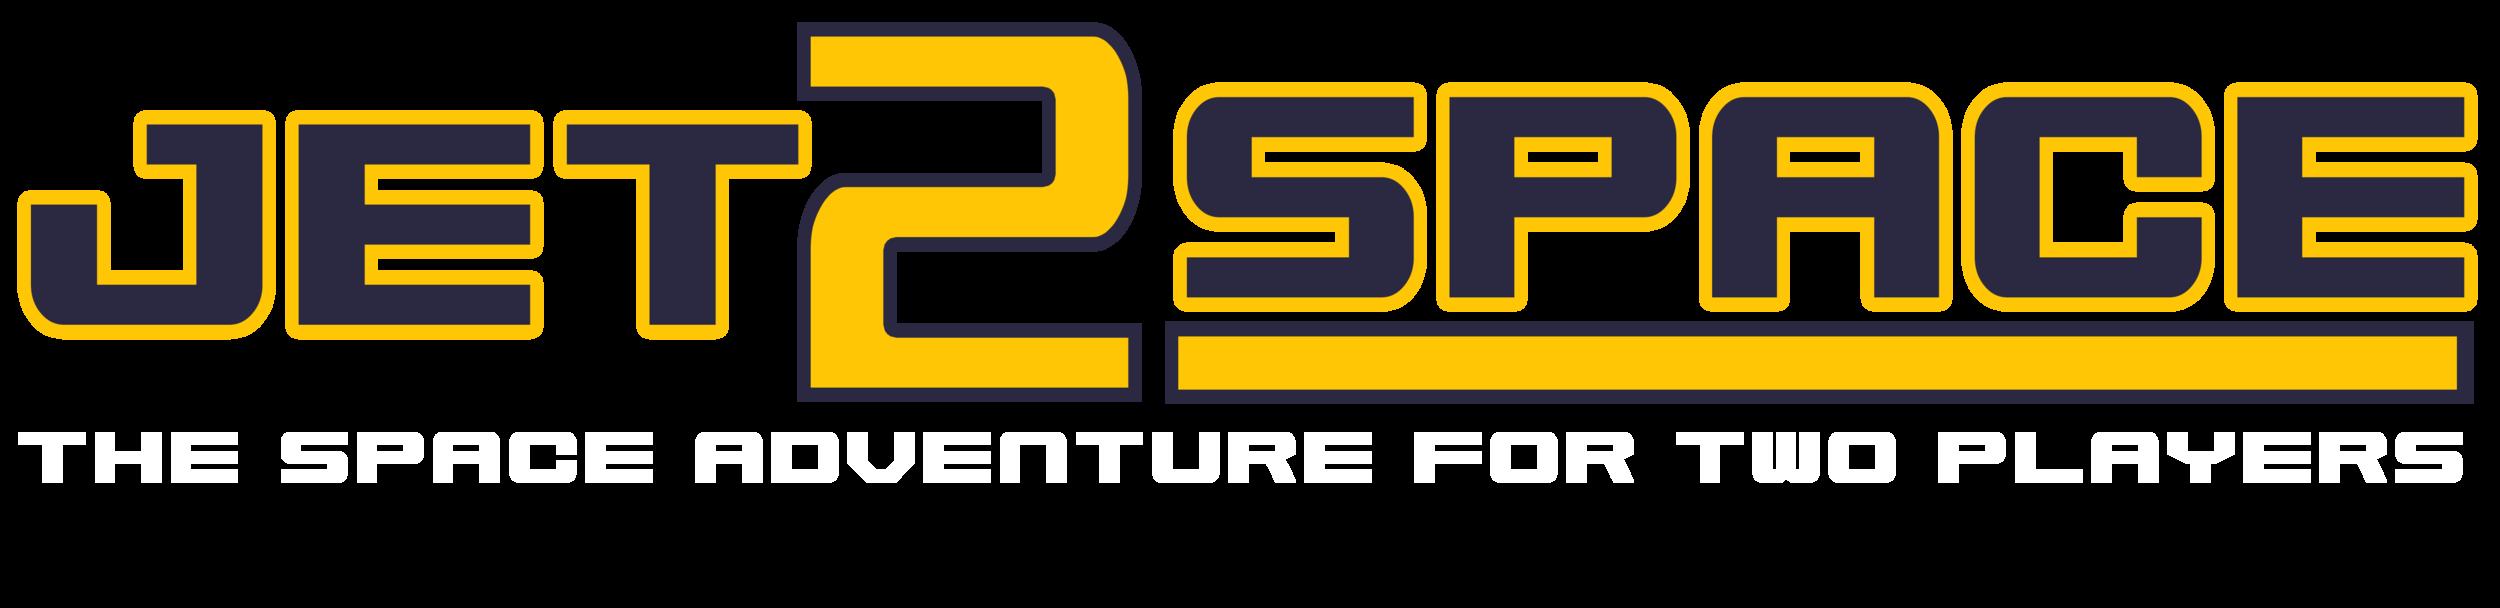 Jet2Space - Full Size - Strapline - For Dark Background.png